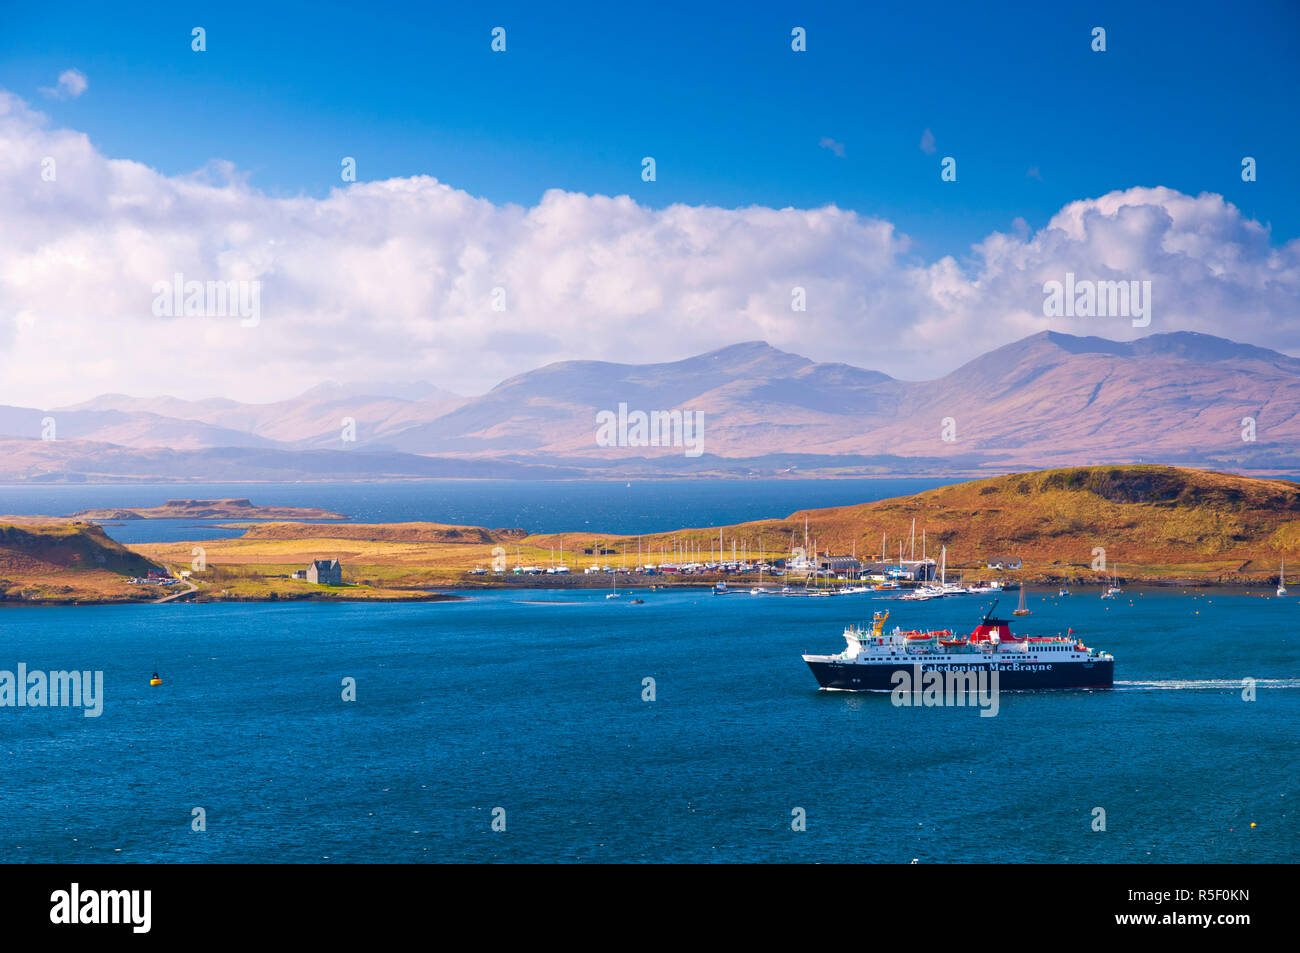 UK, Scotland, Argyll and Bute, Oban, Caledonian MacBrayne Ferry, Isle of Kerrera and Mull beyond - Stock Image